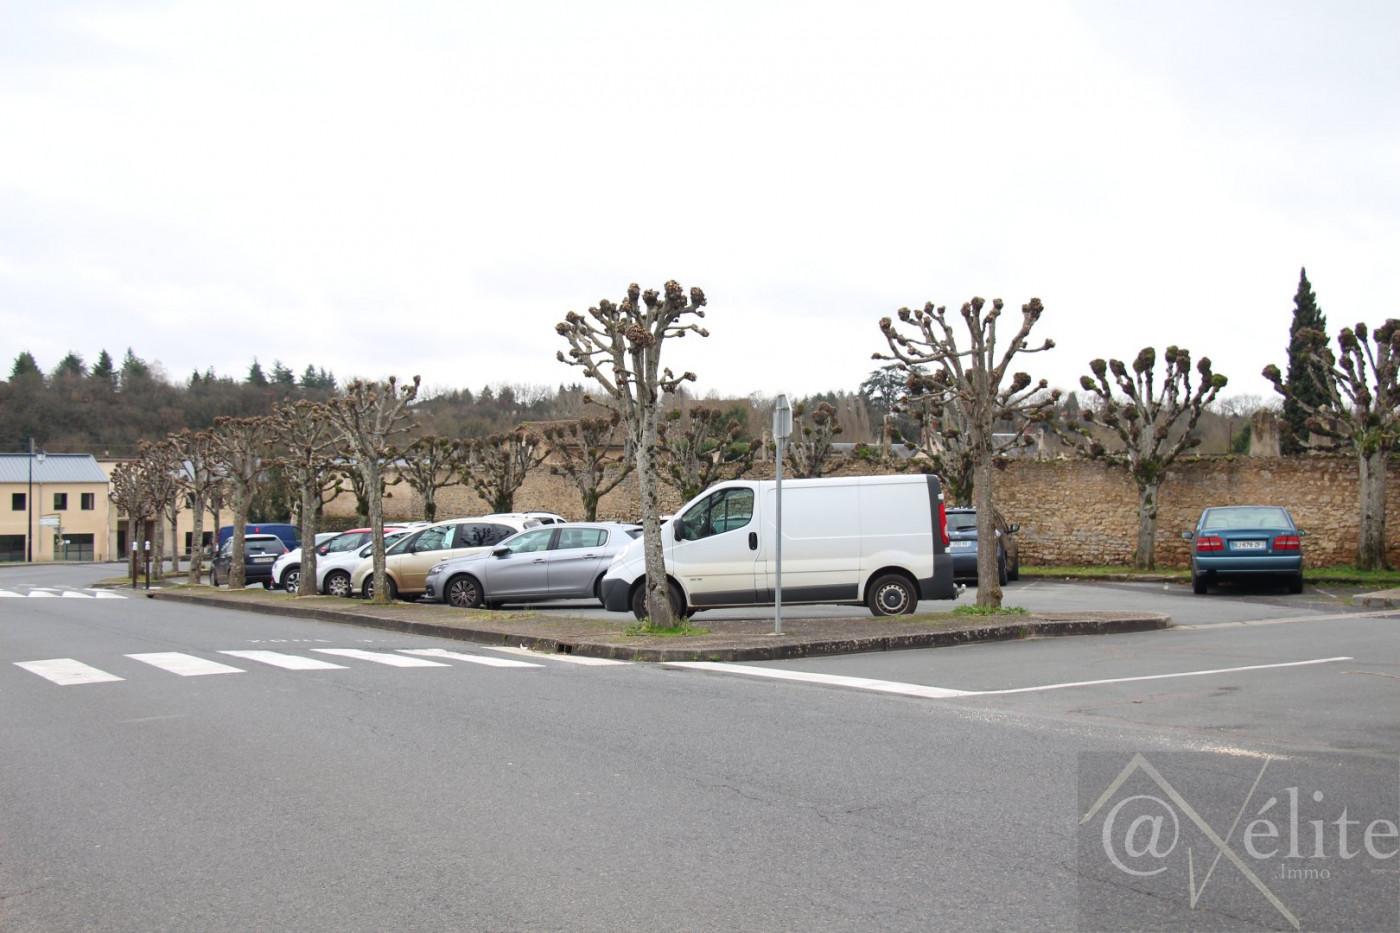 A louer Poitiers 777922088 Axelite sas